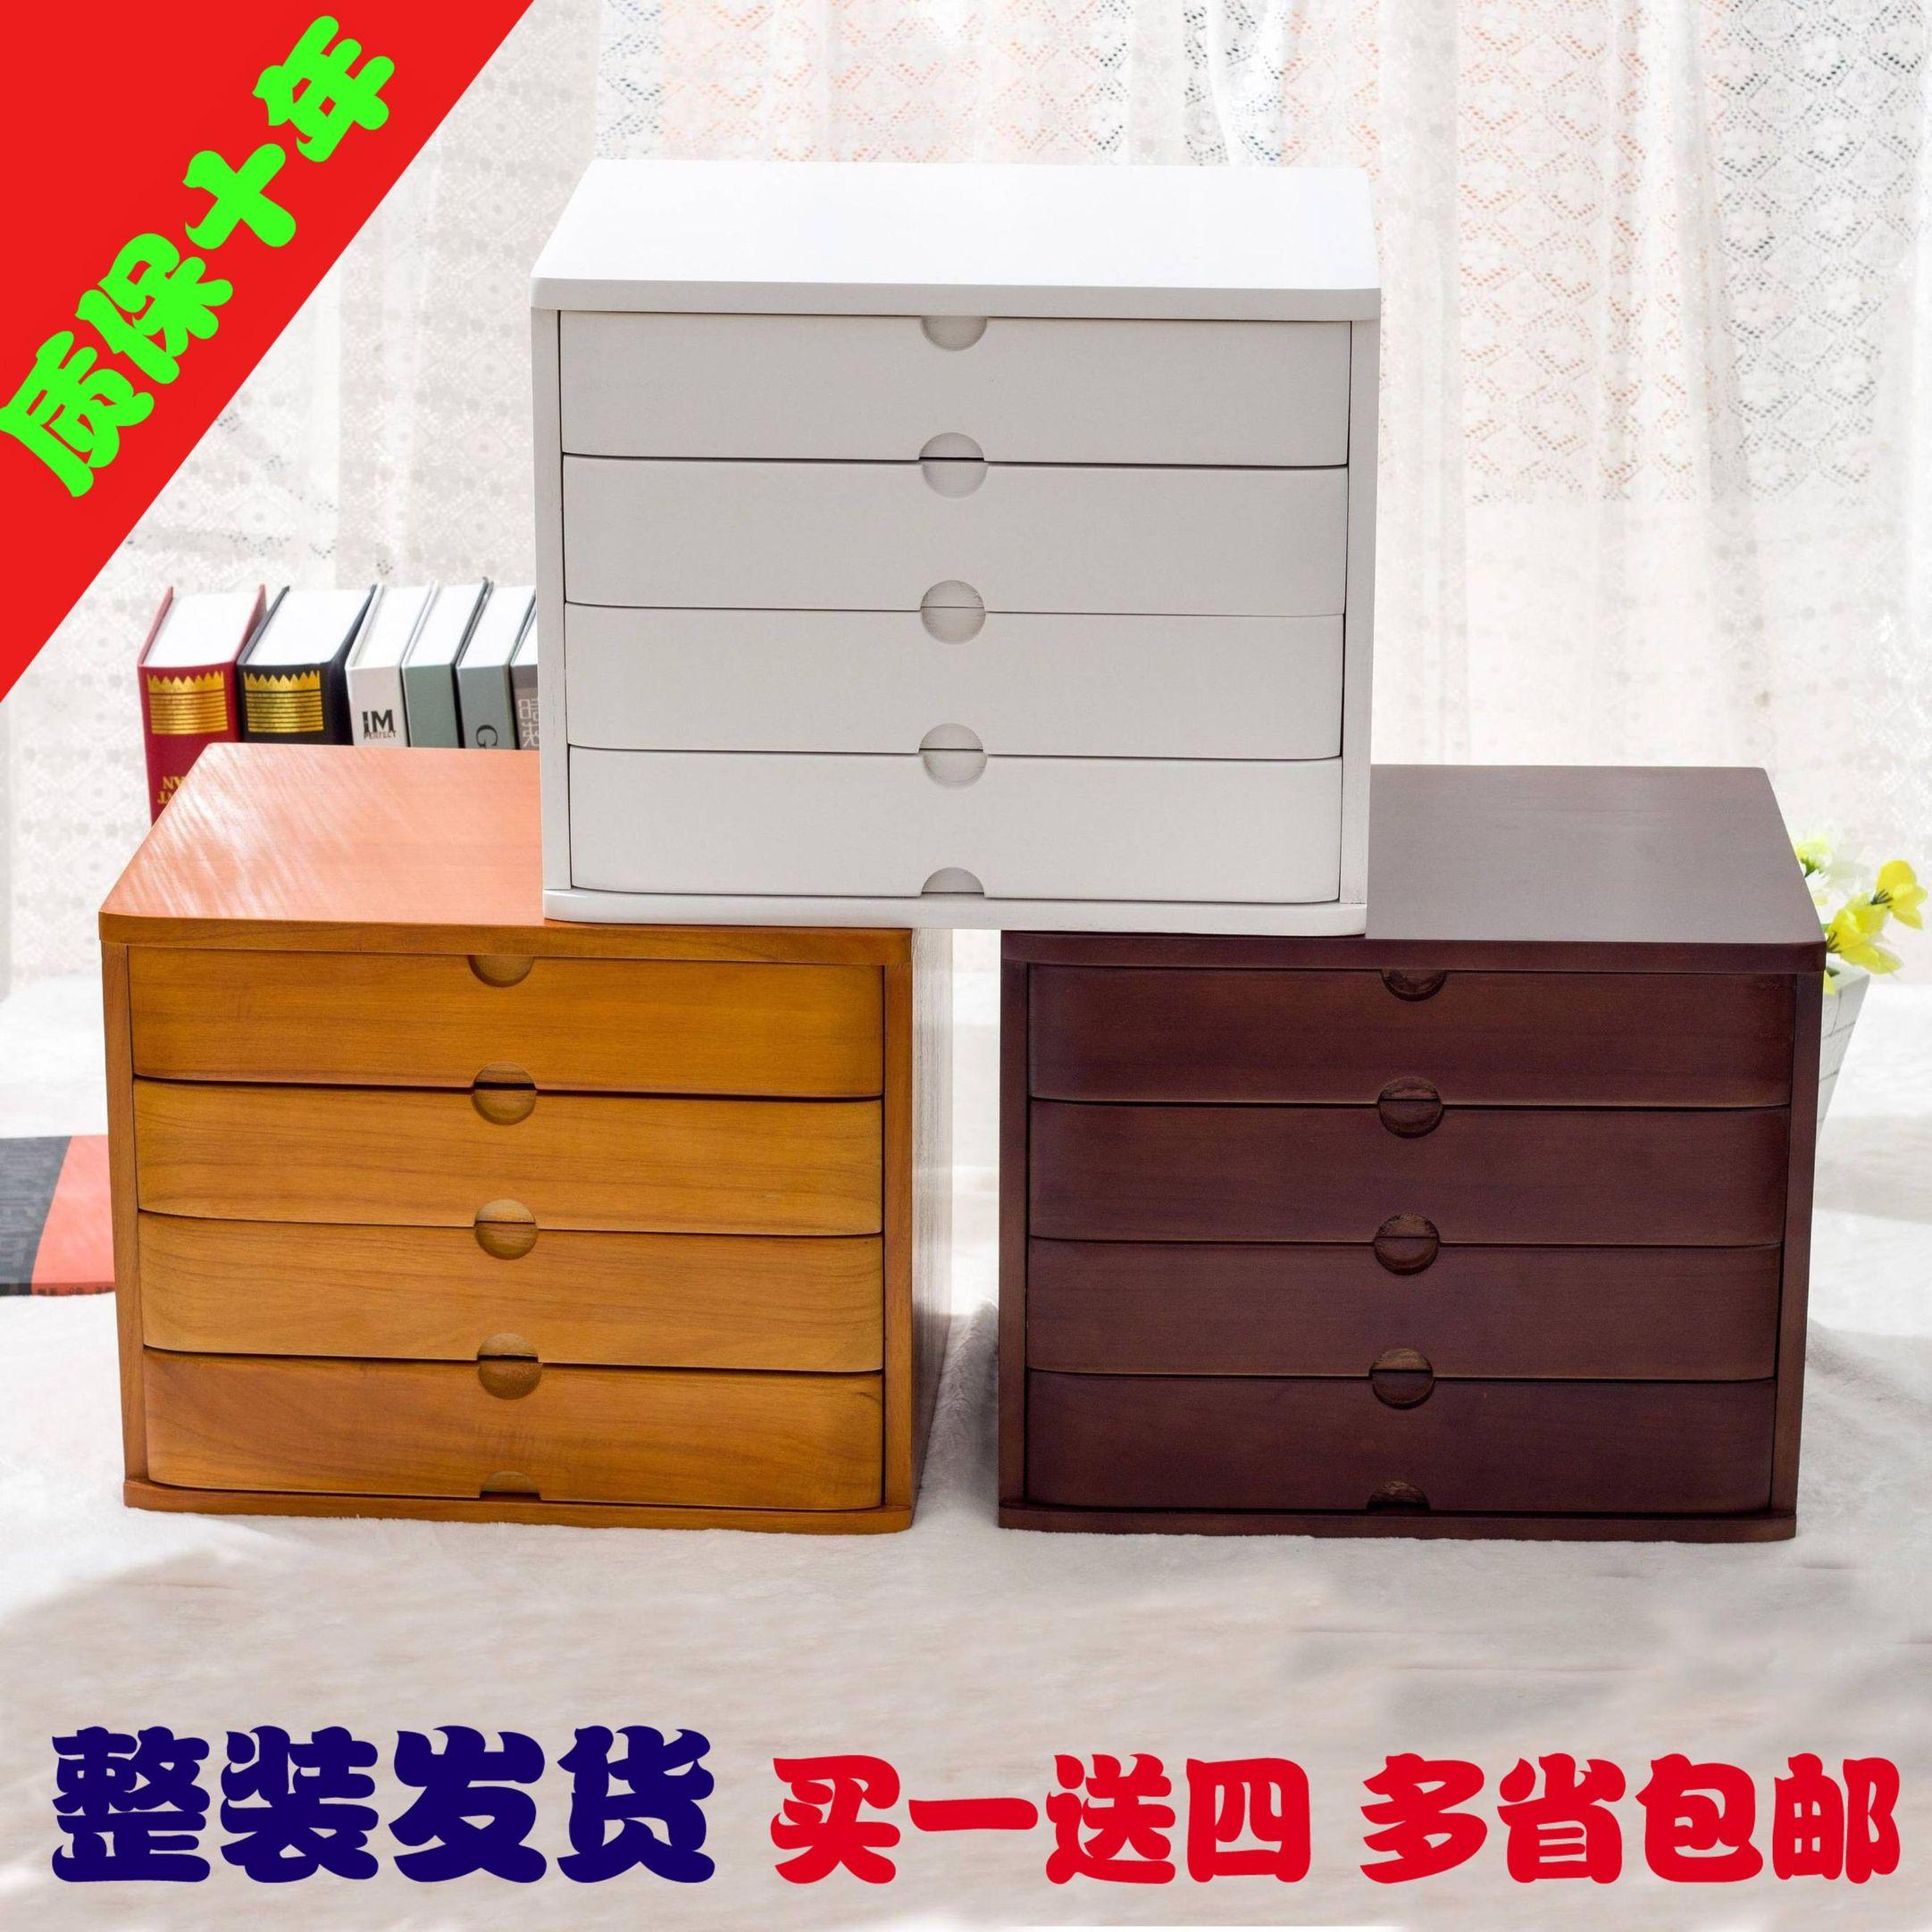 Small Filling Cabinet Popular Filing Cabinet Small Buy Cheap Filing Cabinet Small Lots